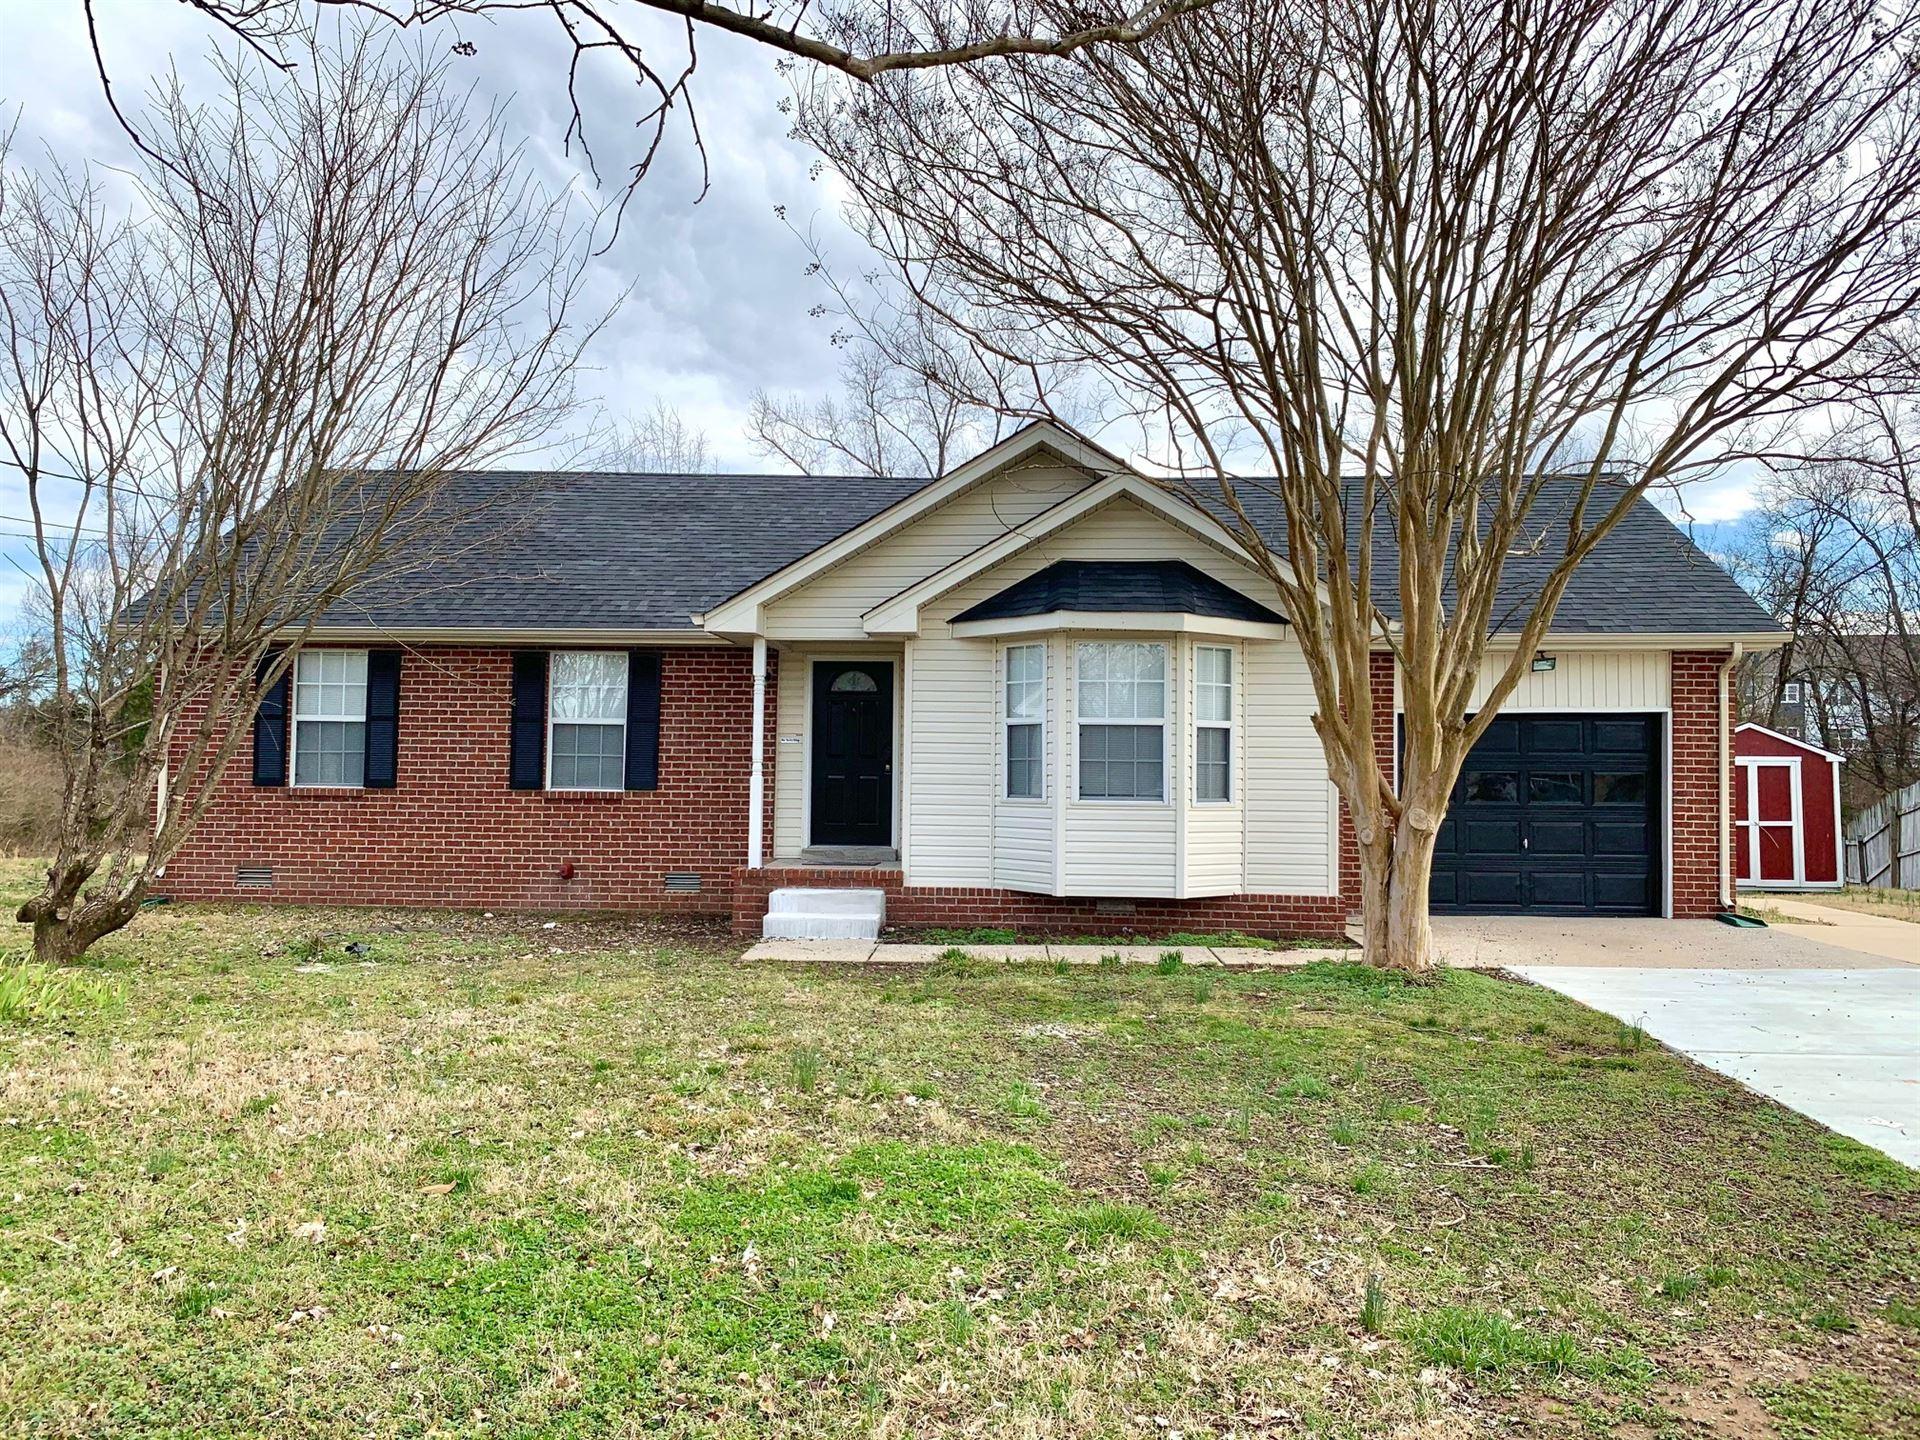 1112 Forestwood Ct, Smyrna, TN 37167 - MLS#: 2233283